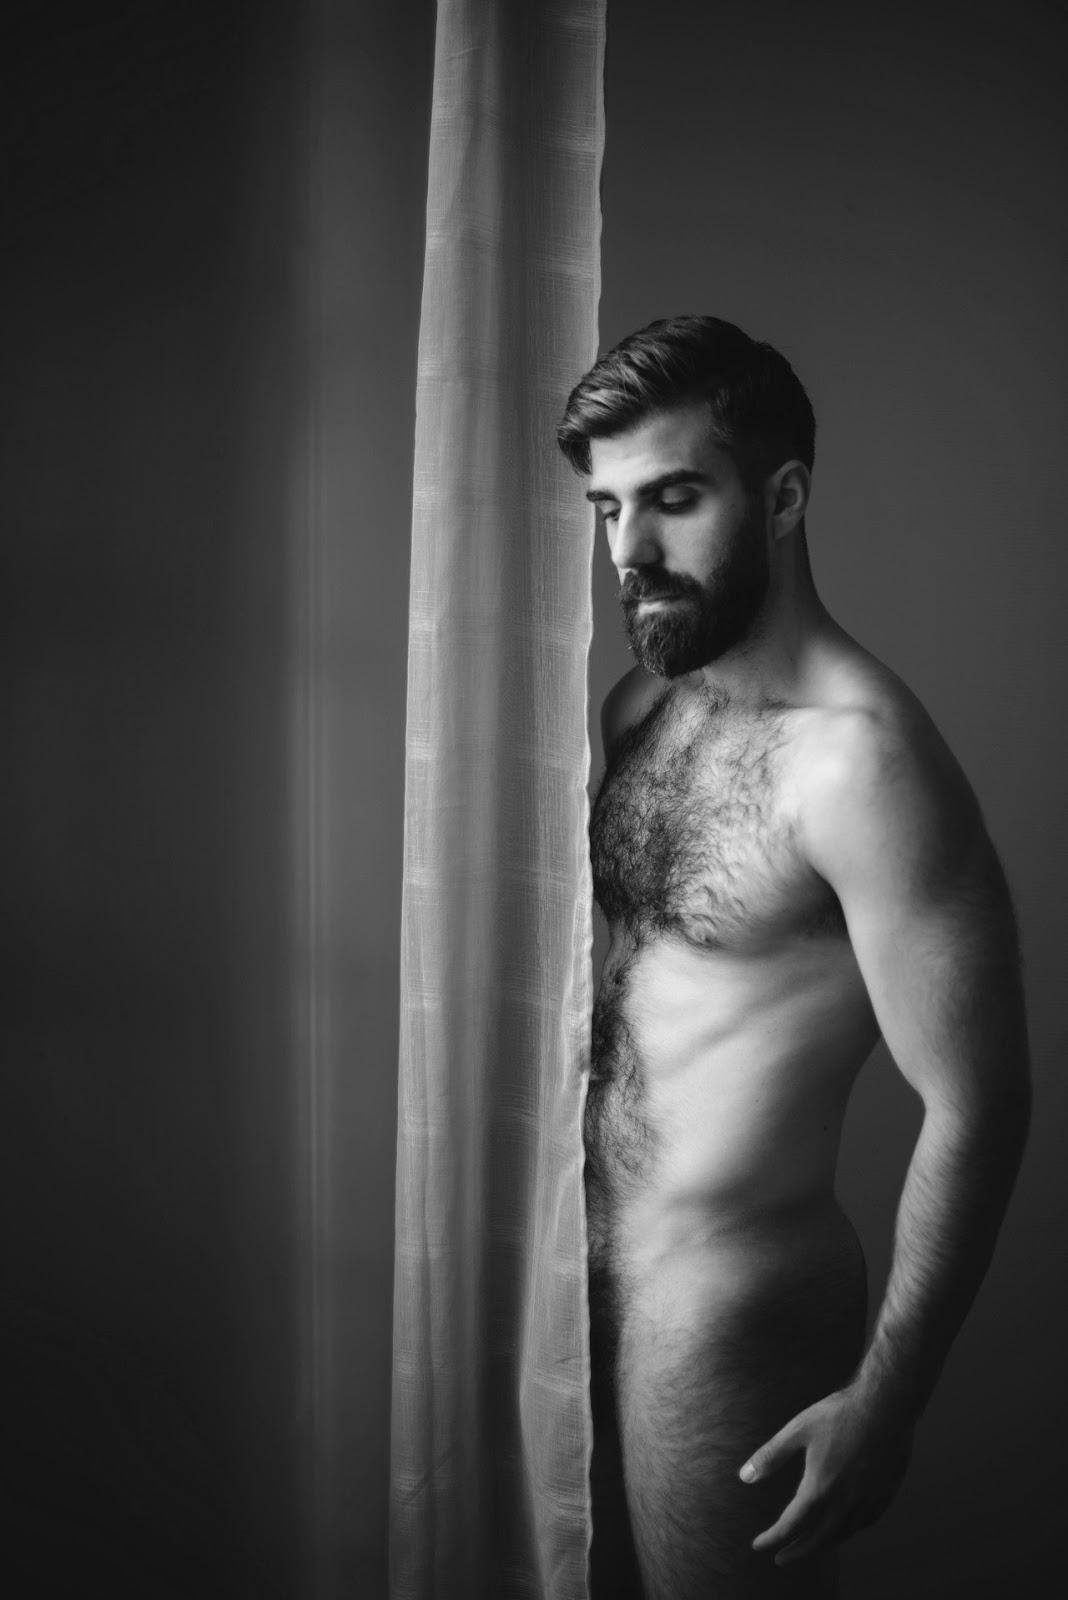 AS, by by Patryck Lebrun ft Armando Santos